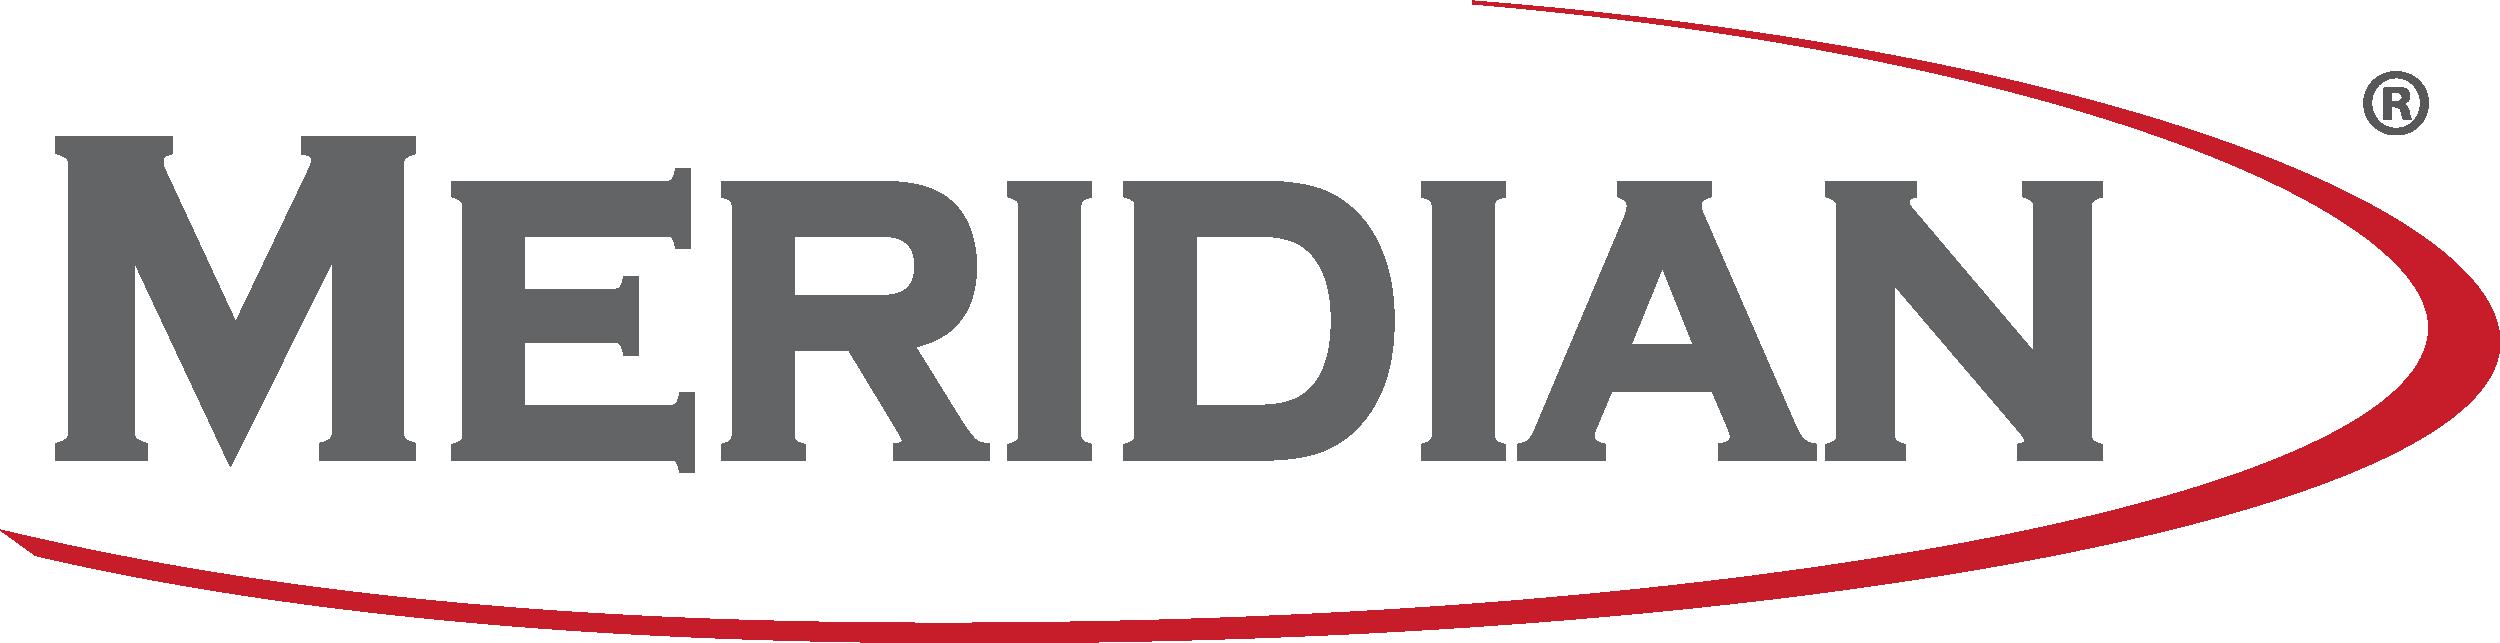 Meridian-Colour-Logo-600px-wide